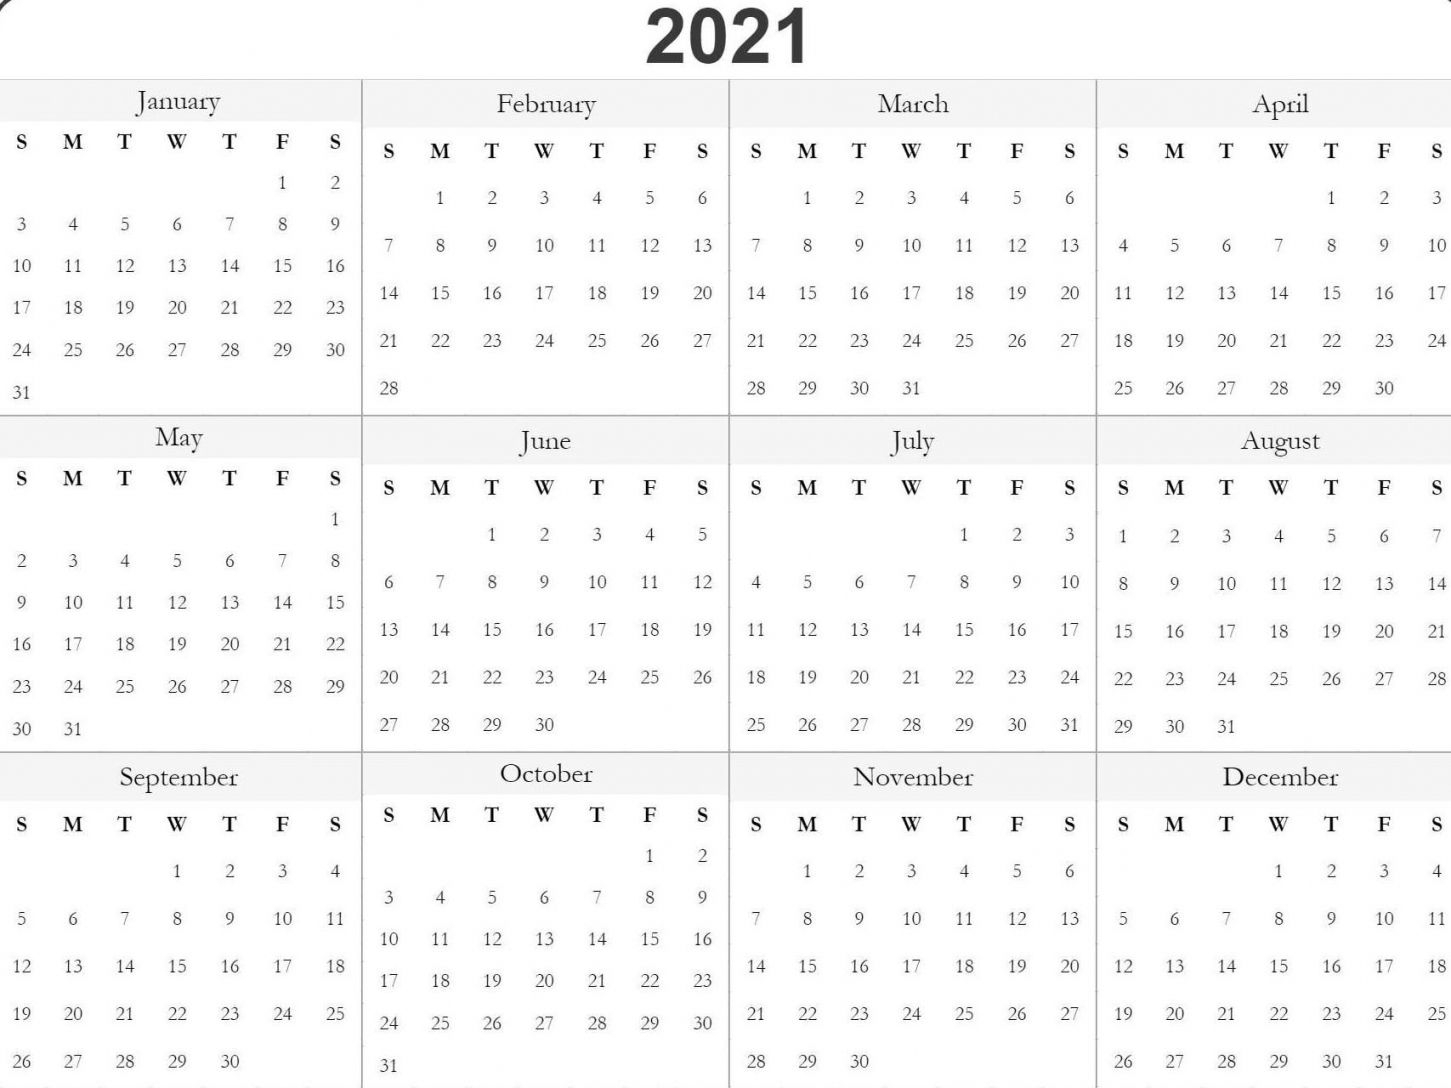 Printable 2021 Julian Date Calendar In 2020 | Free Printable throughout 2021 Julian Calendar